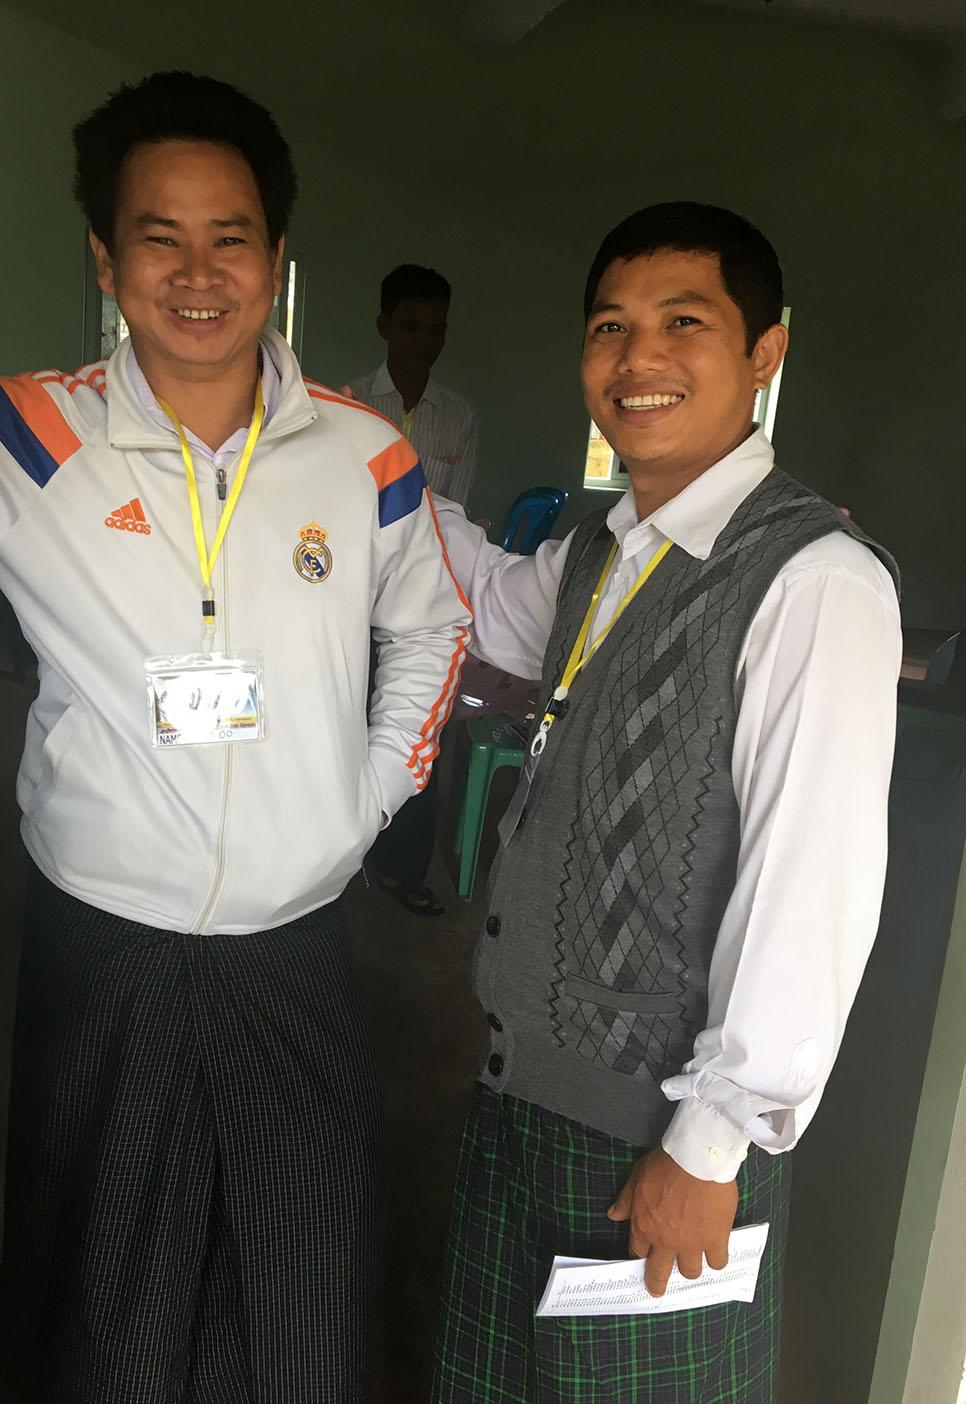 missionaries-1218.jpg